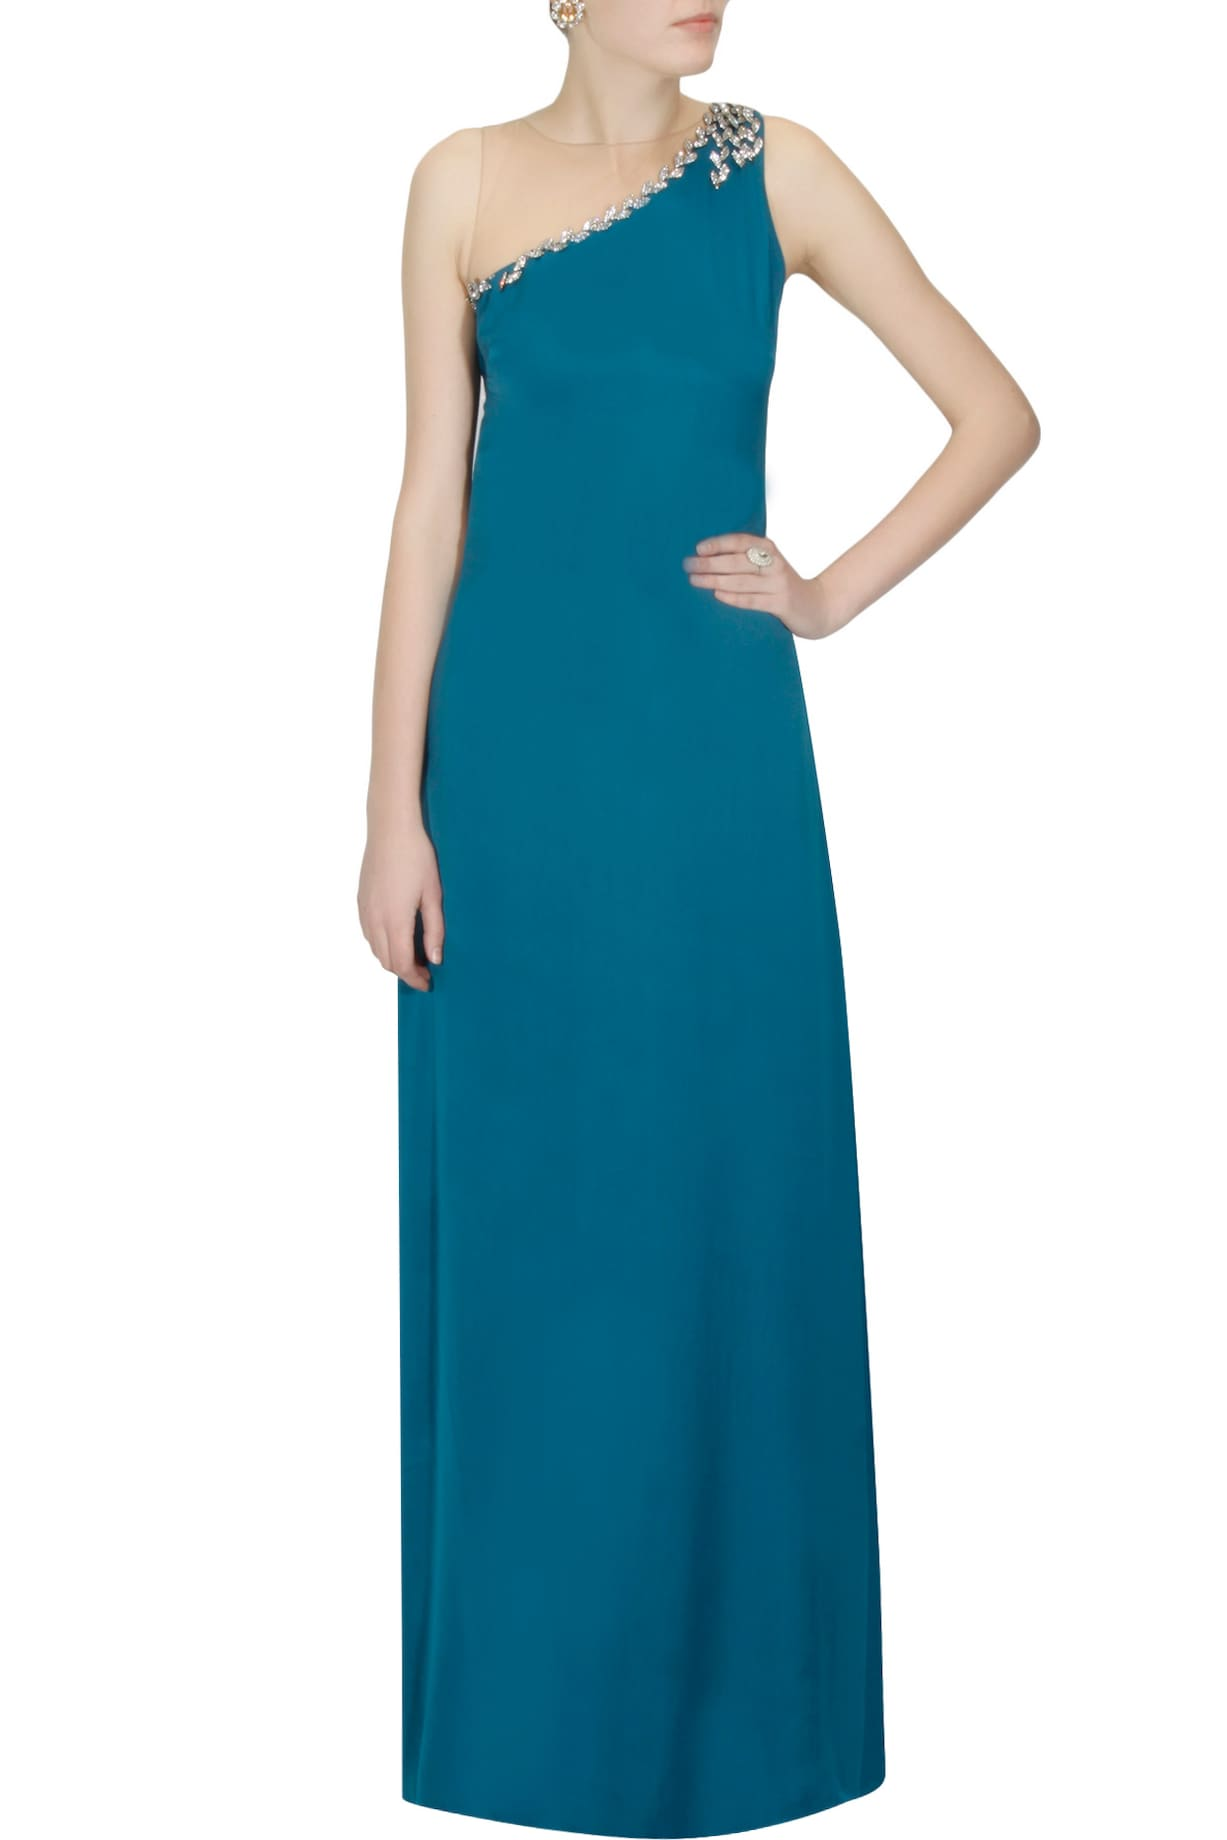 Platinoir Gowns